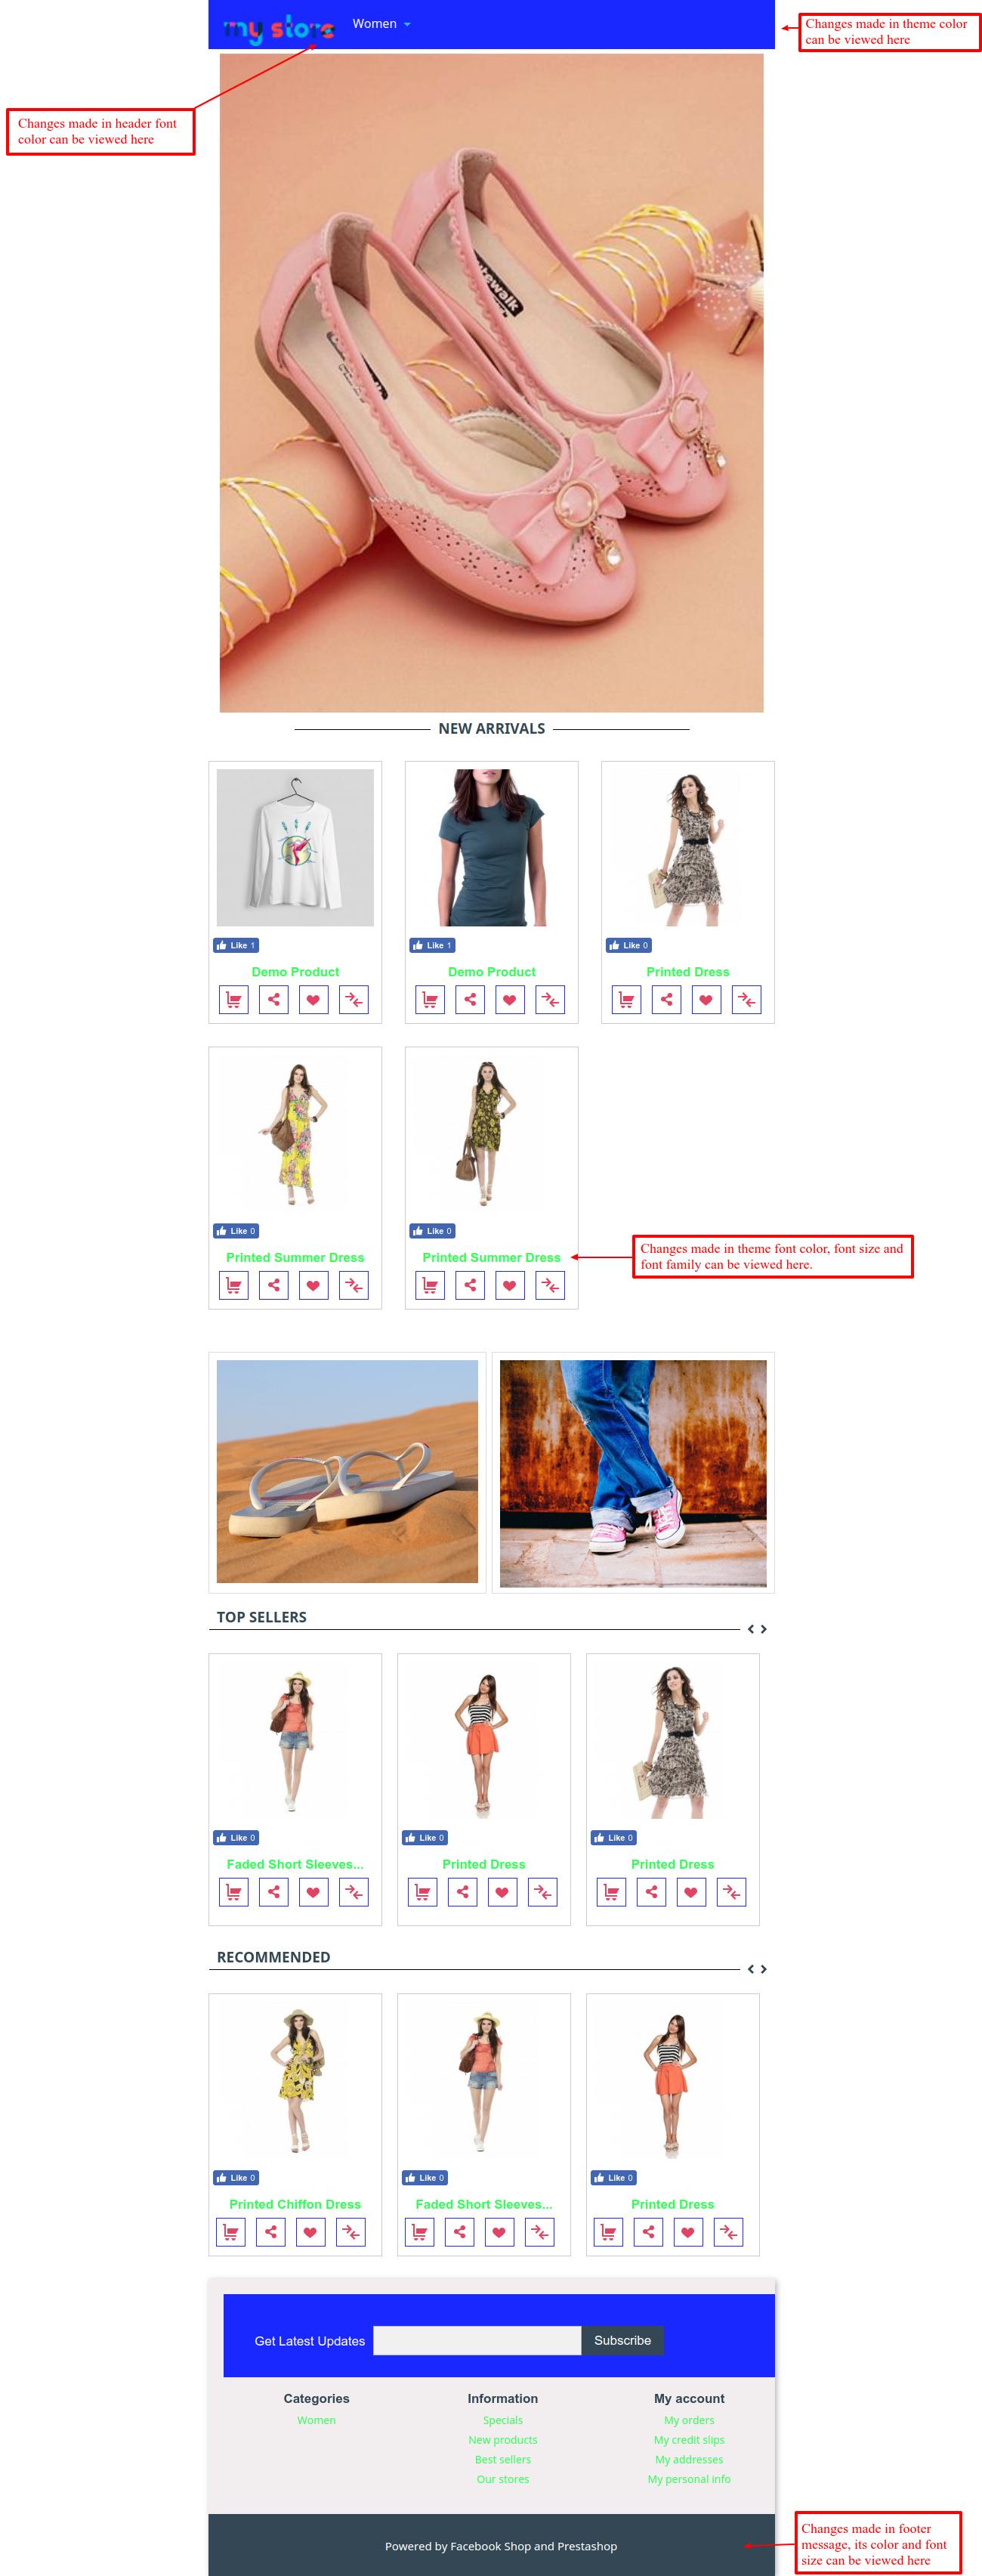 Prestashop Facebook Shop | Store Integration with Facebook